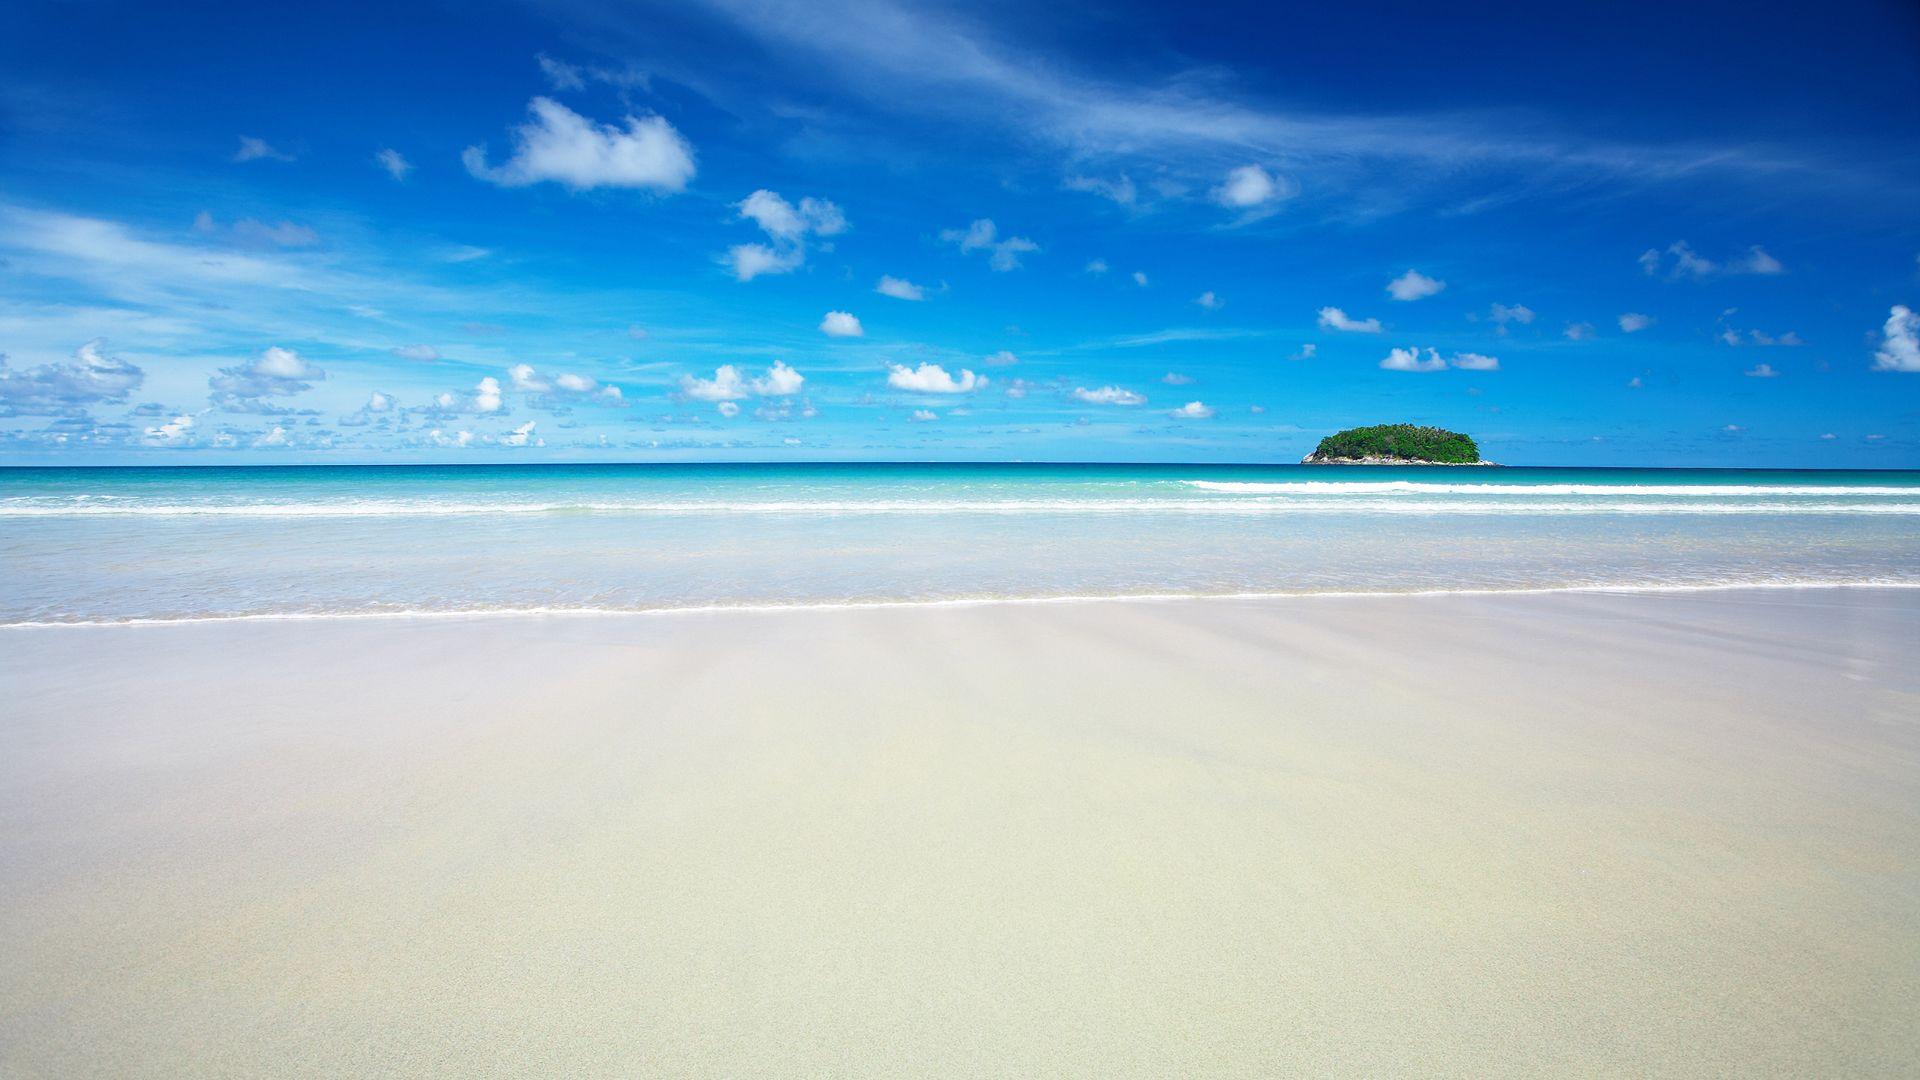 Beach Background Wallpaper 1080p 6948220 1920x1080